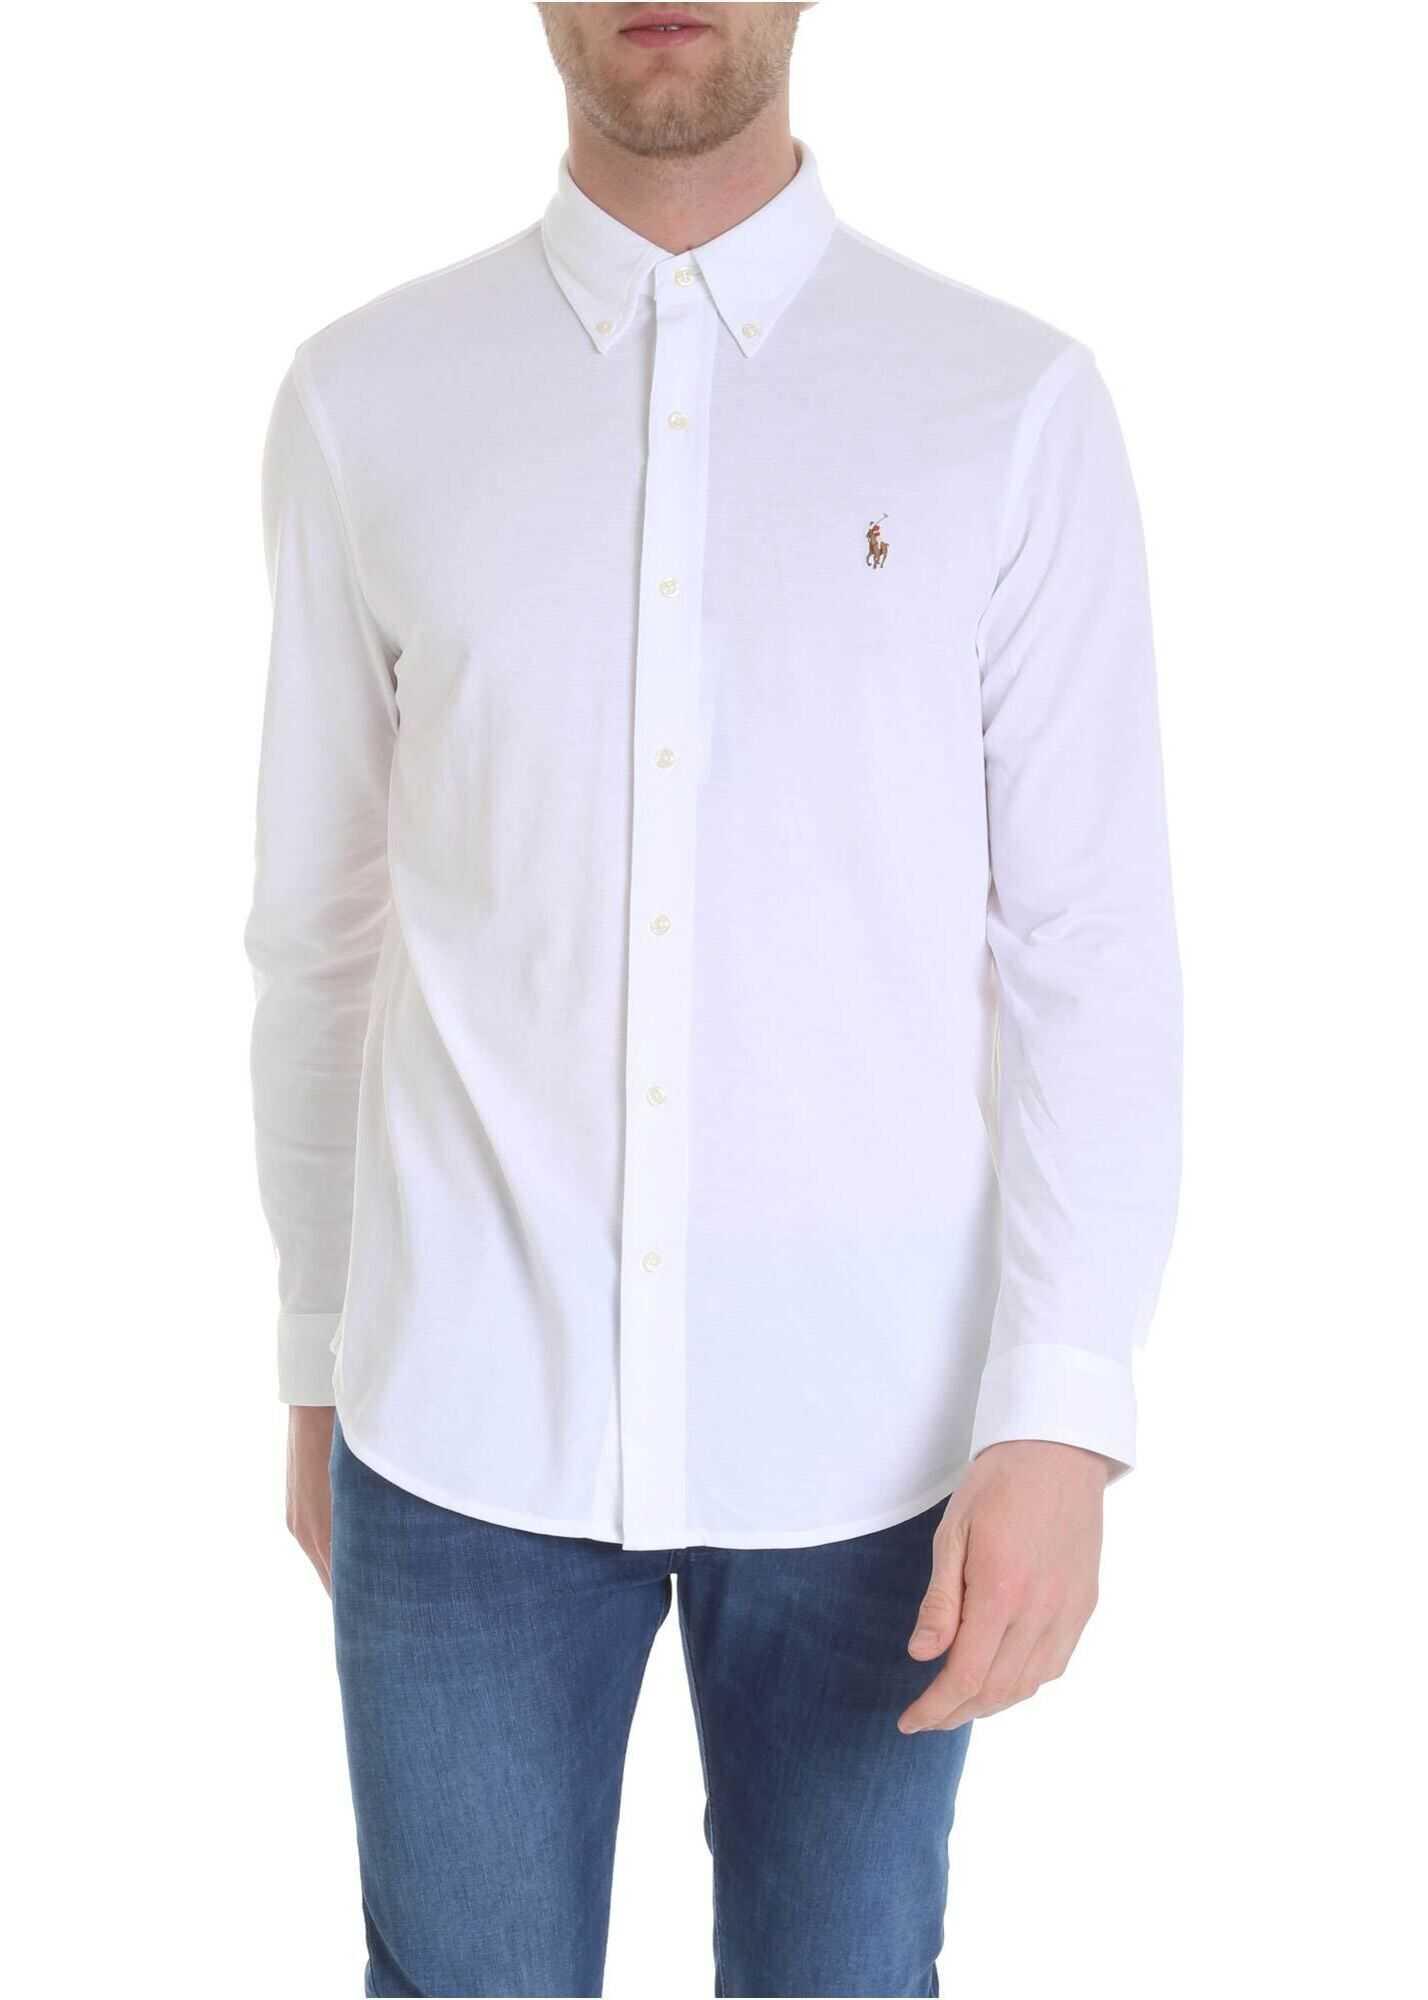 Ralph Lauren White Button-Down Oxford Shirt White imagine